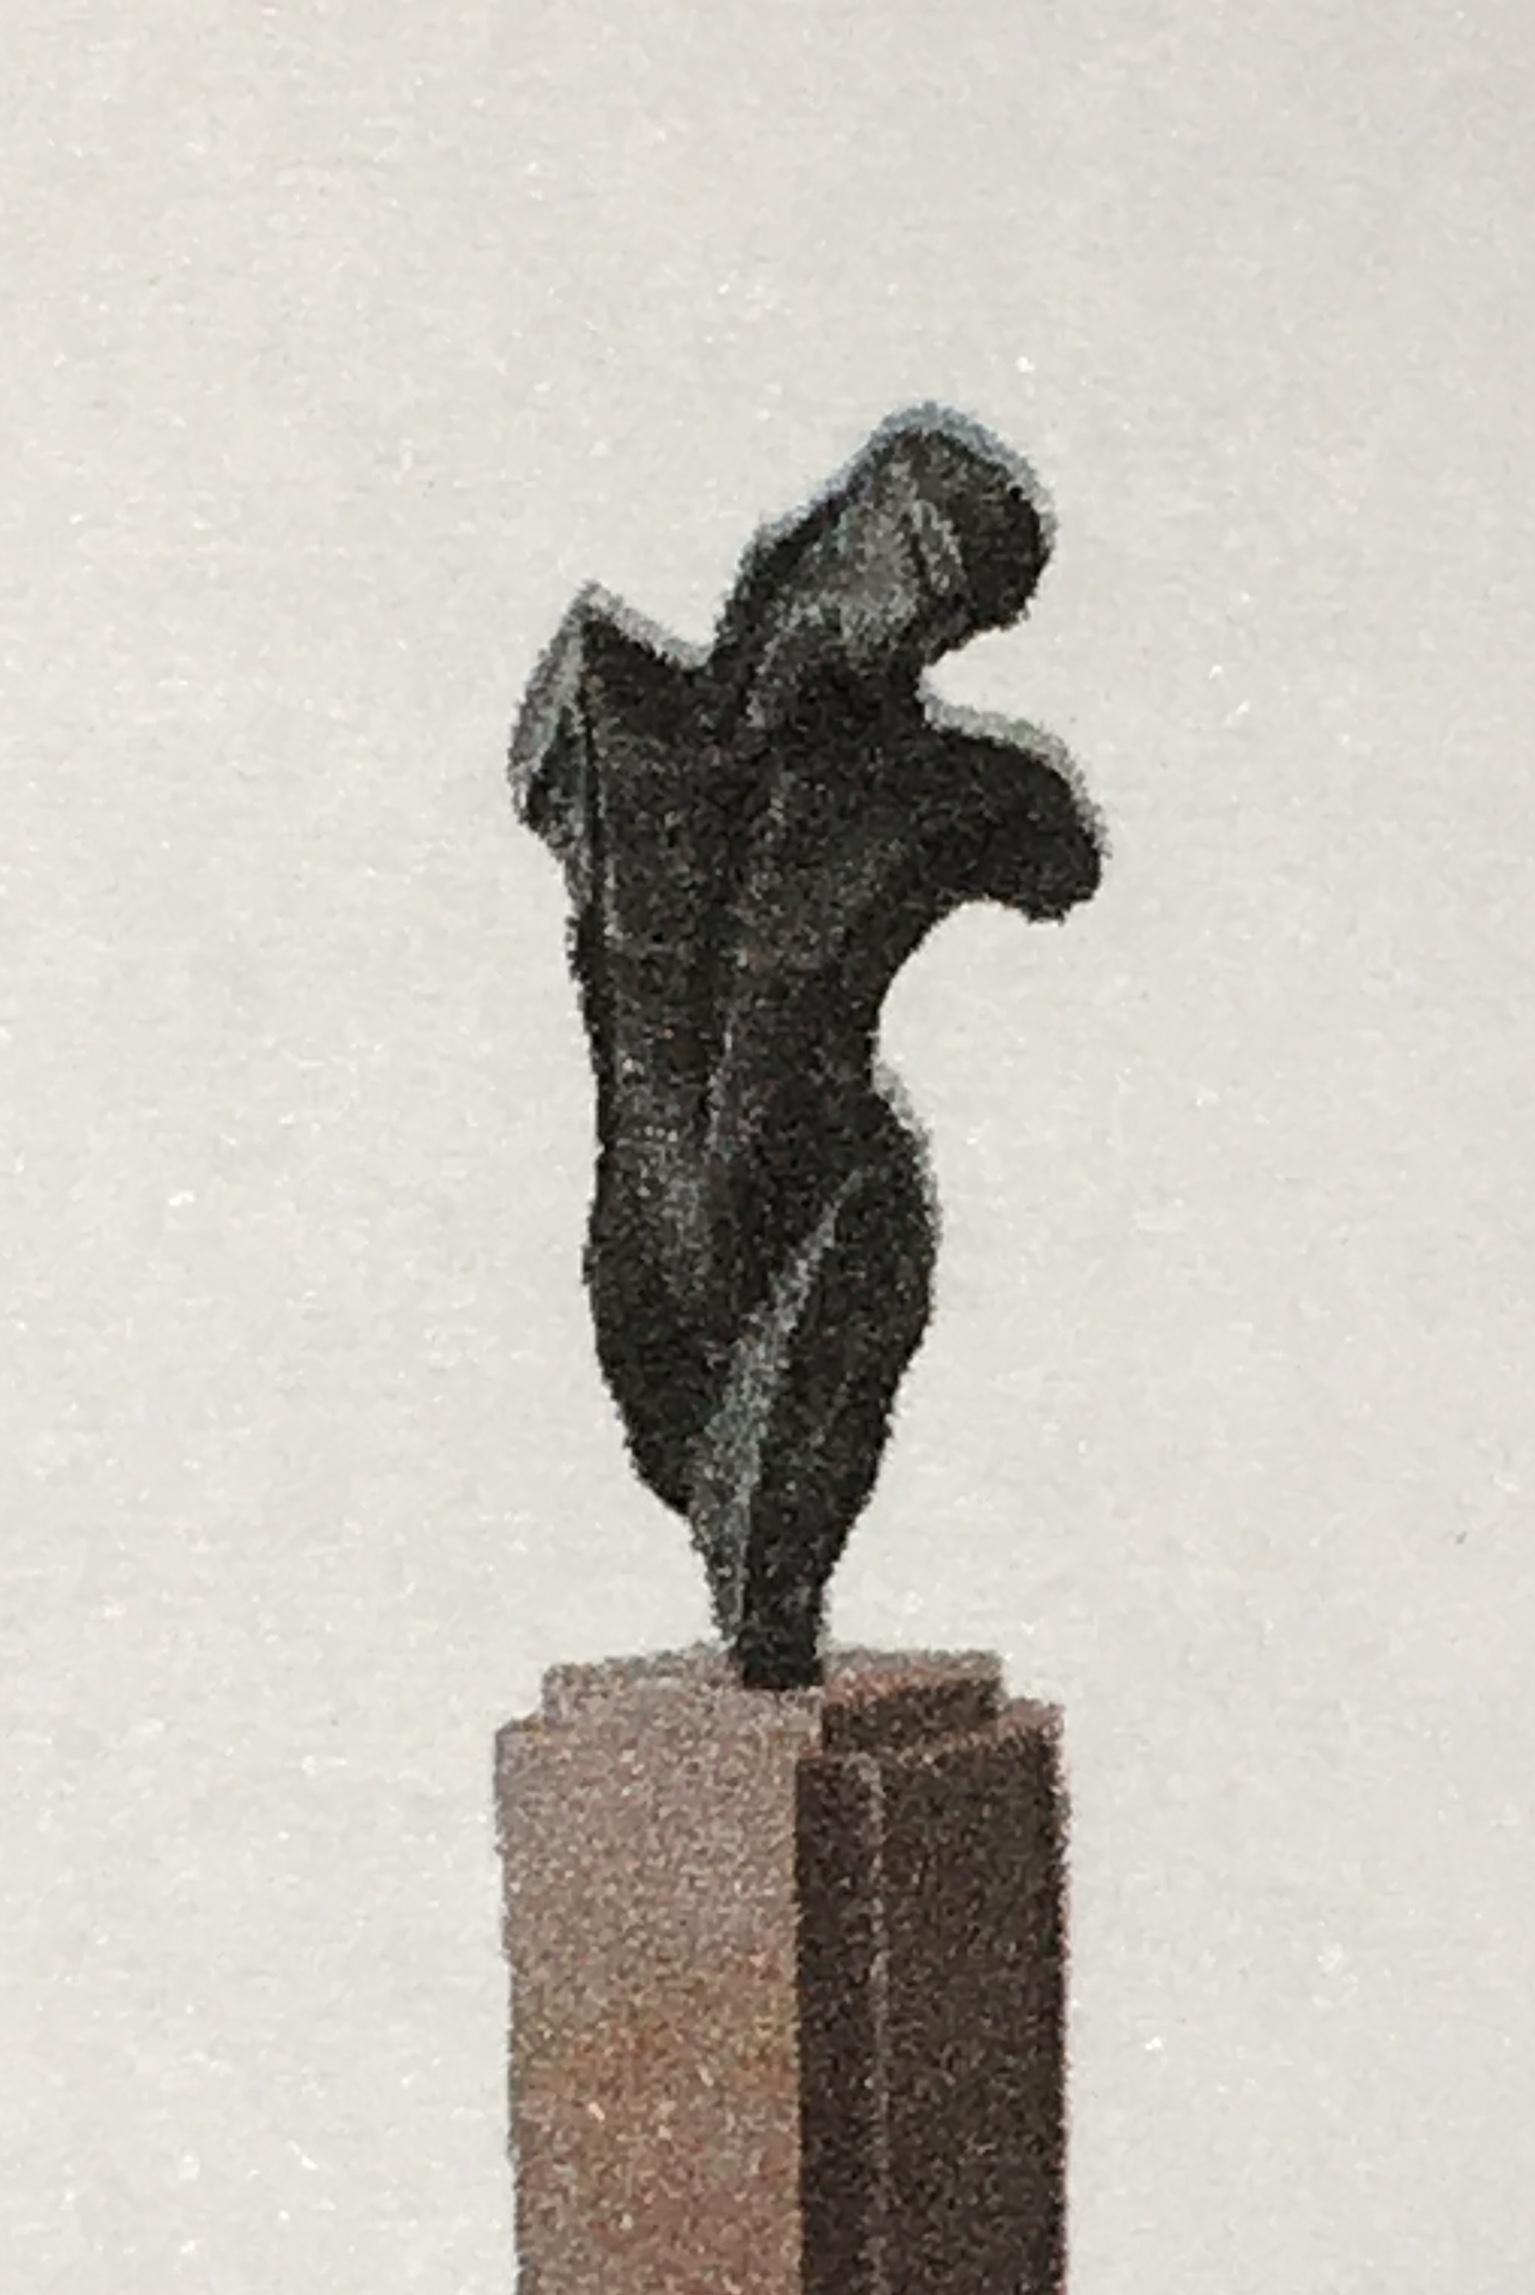 SANTOS LOPES - TEIA IRREAL - 42 X 12 X 0